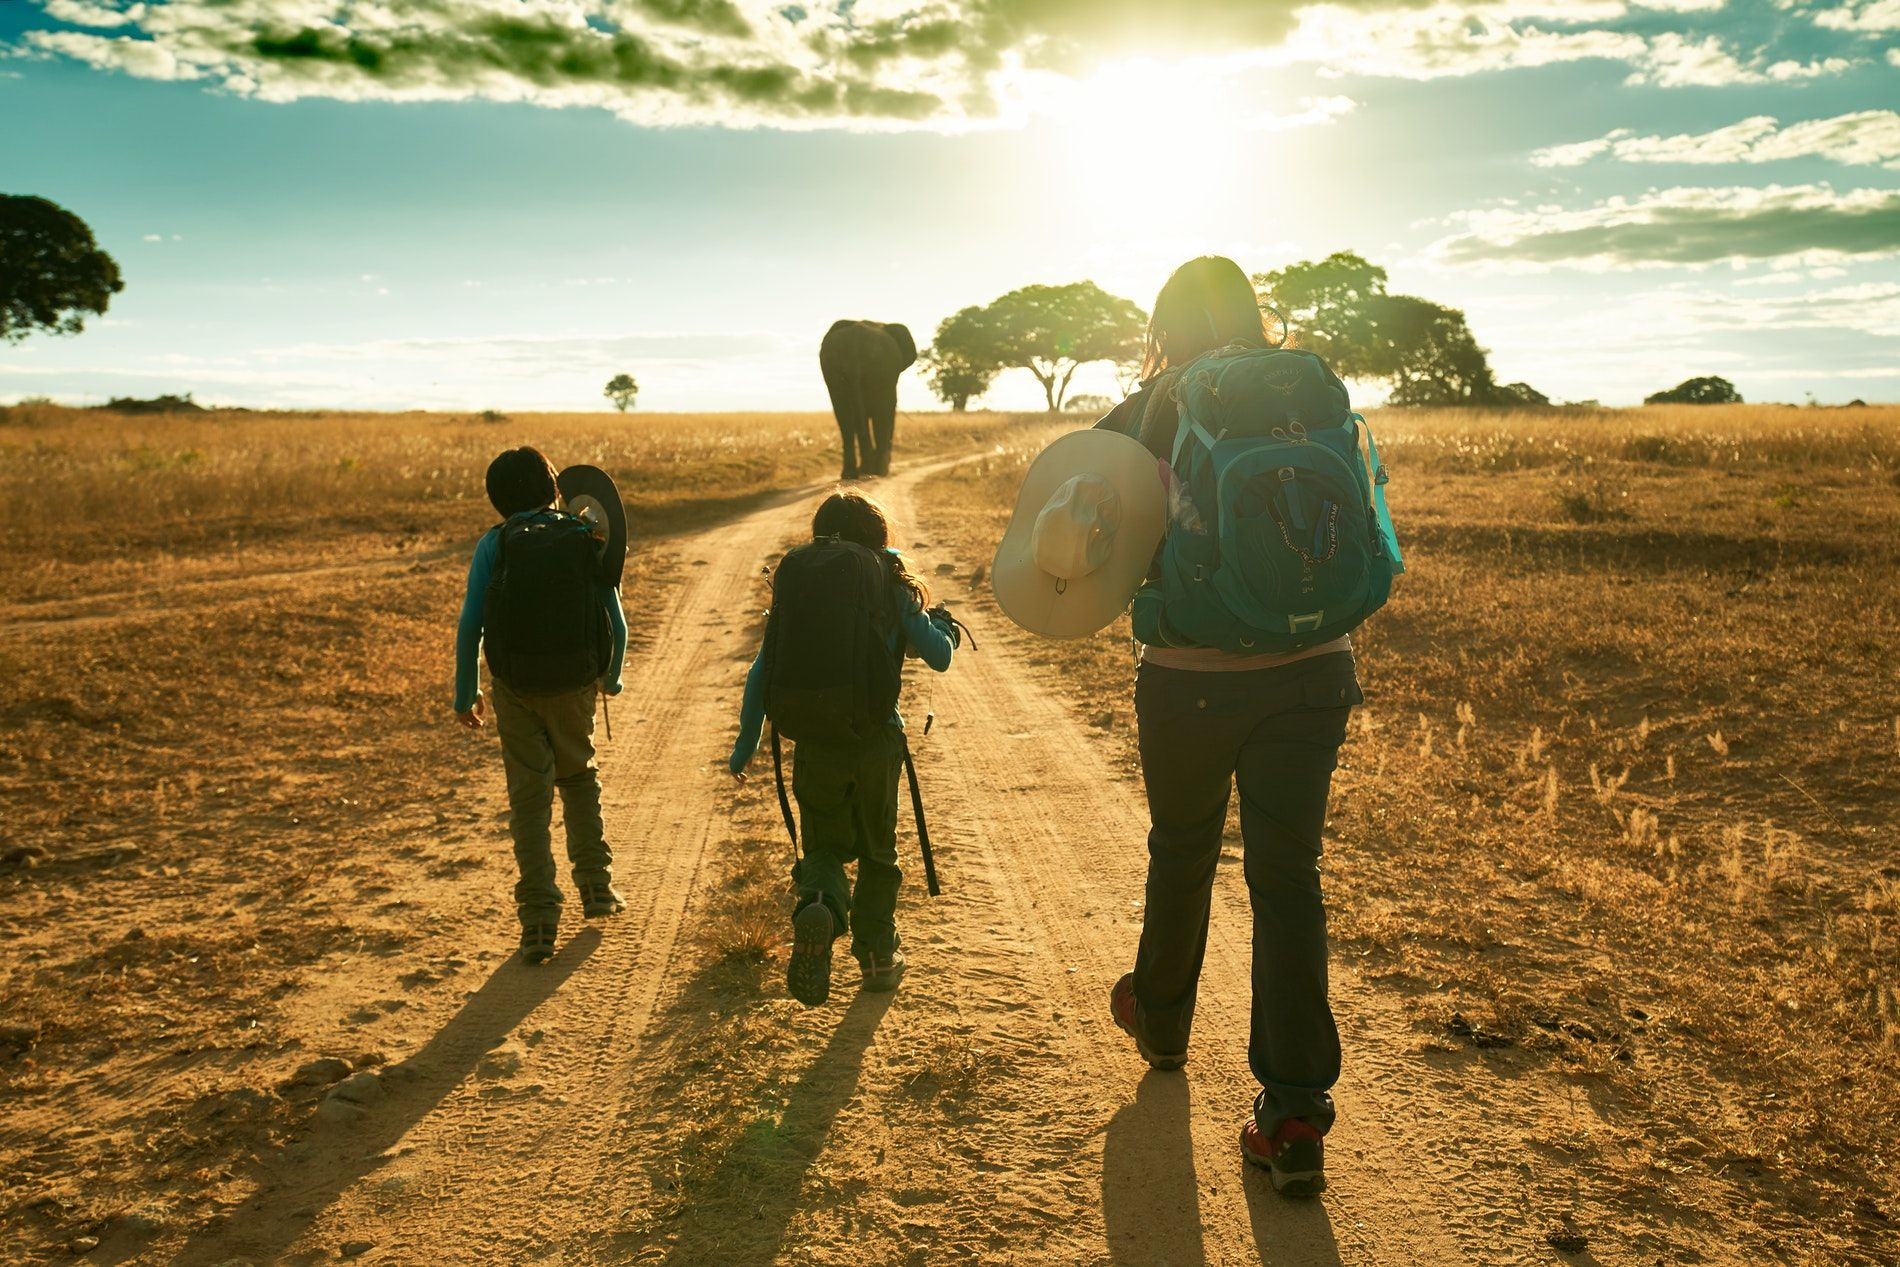 volunteers walking with elephant in zimbabwe during sunset